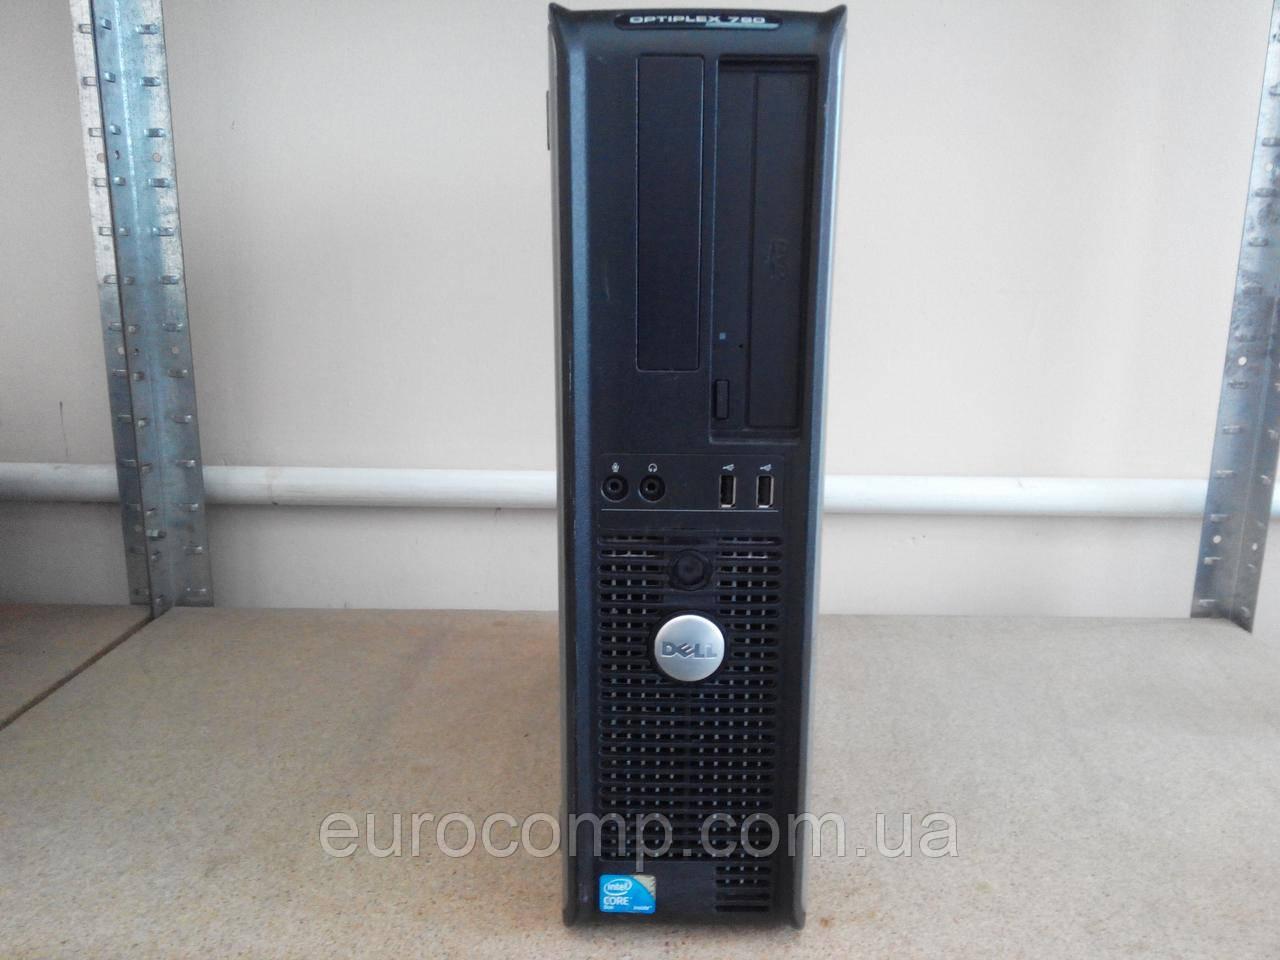 Компьютер для дома и офиса Dell Optiplex 760 DT (C2D E7400/4GB/160GB)